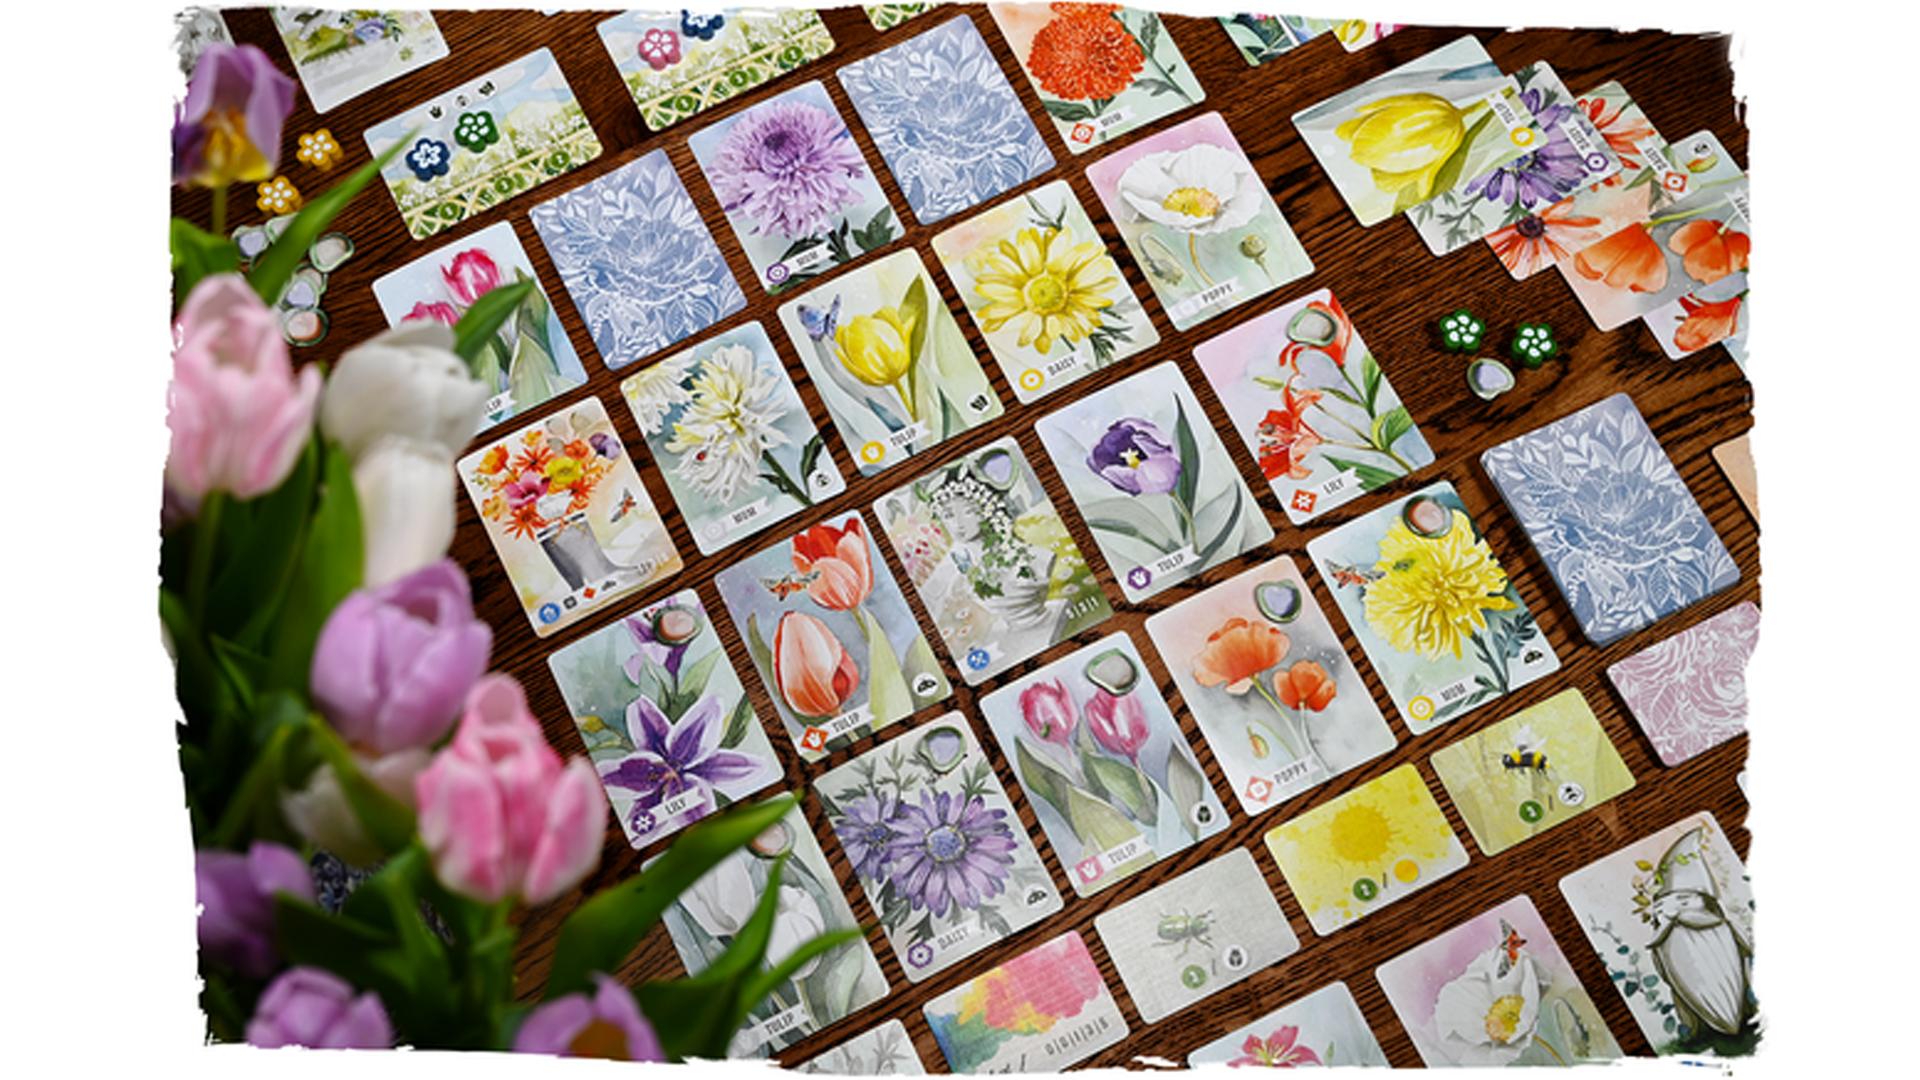 Floriferous board game cards